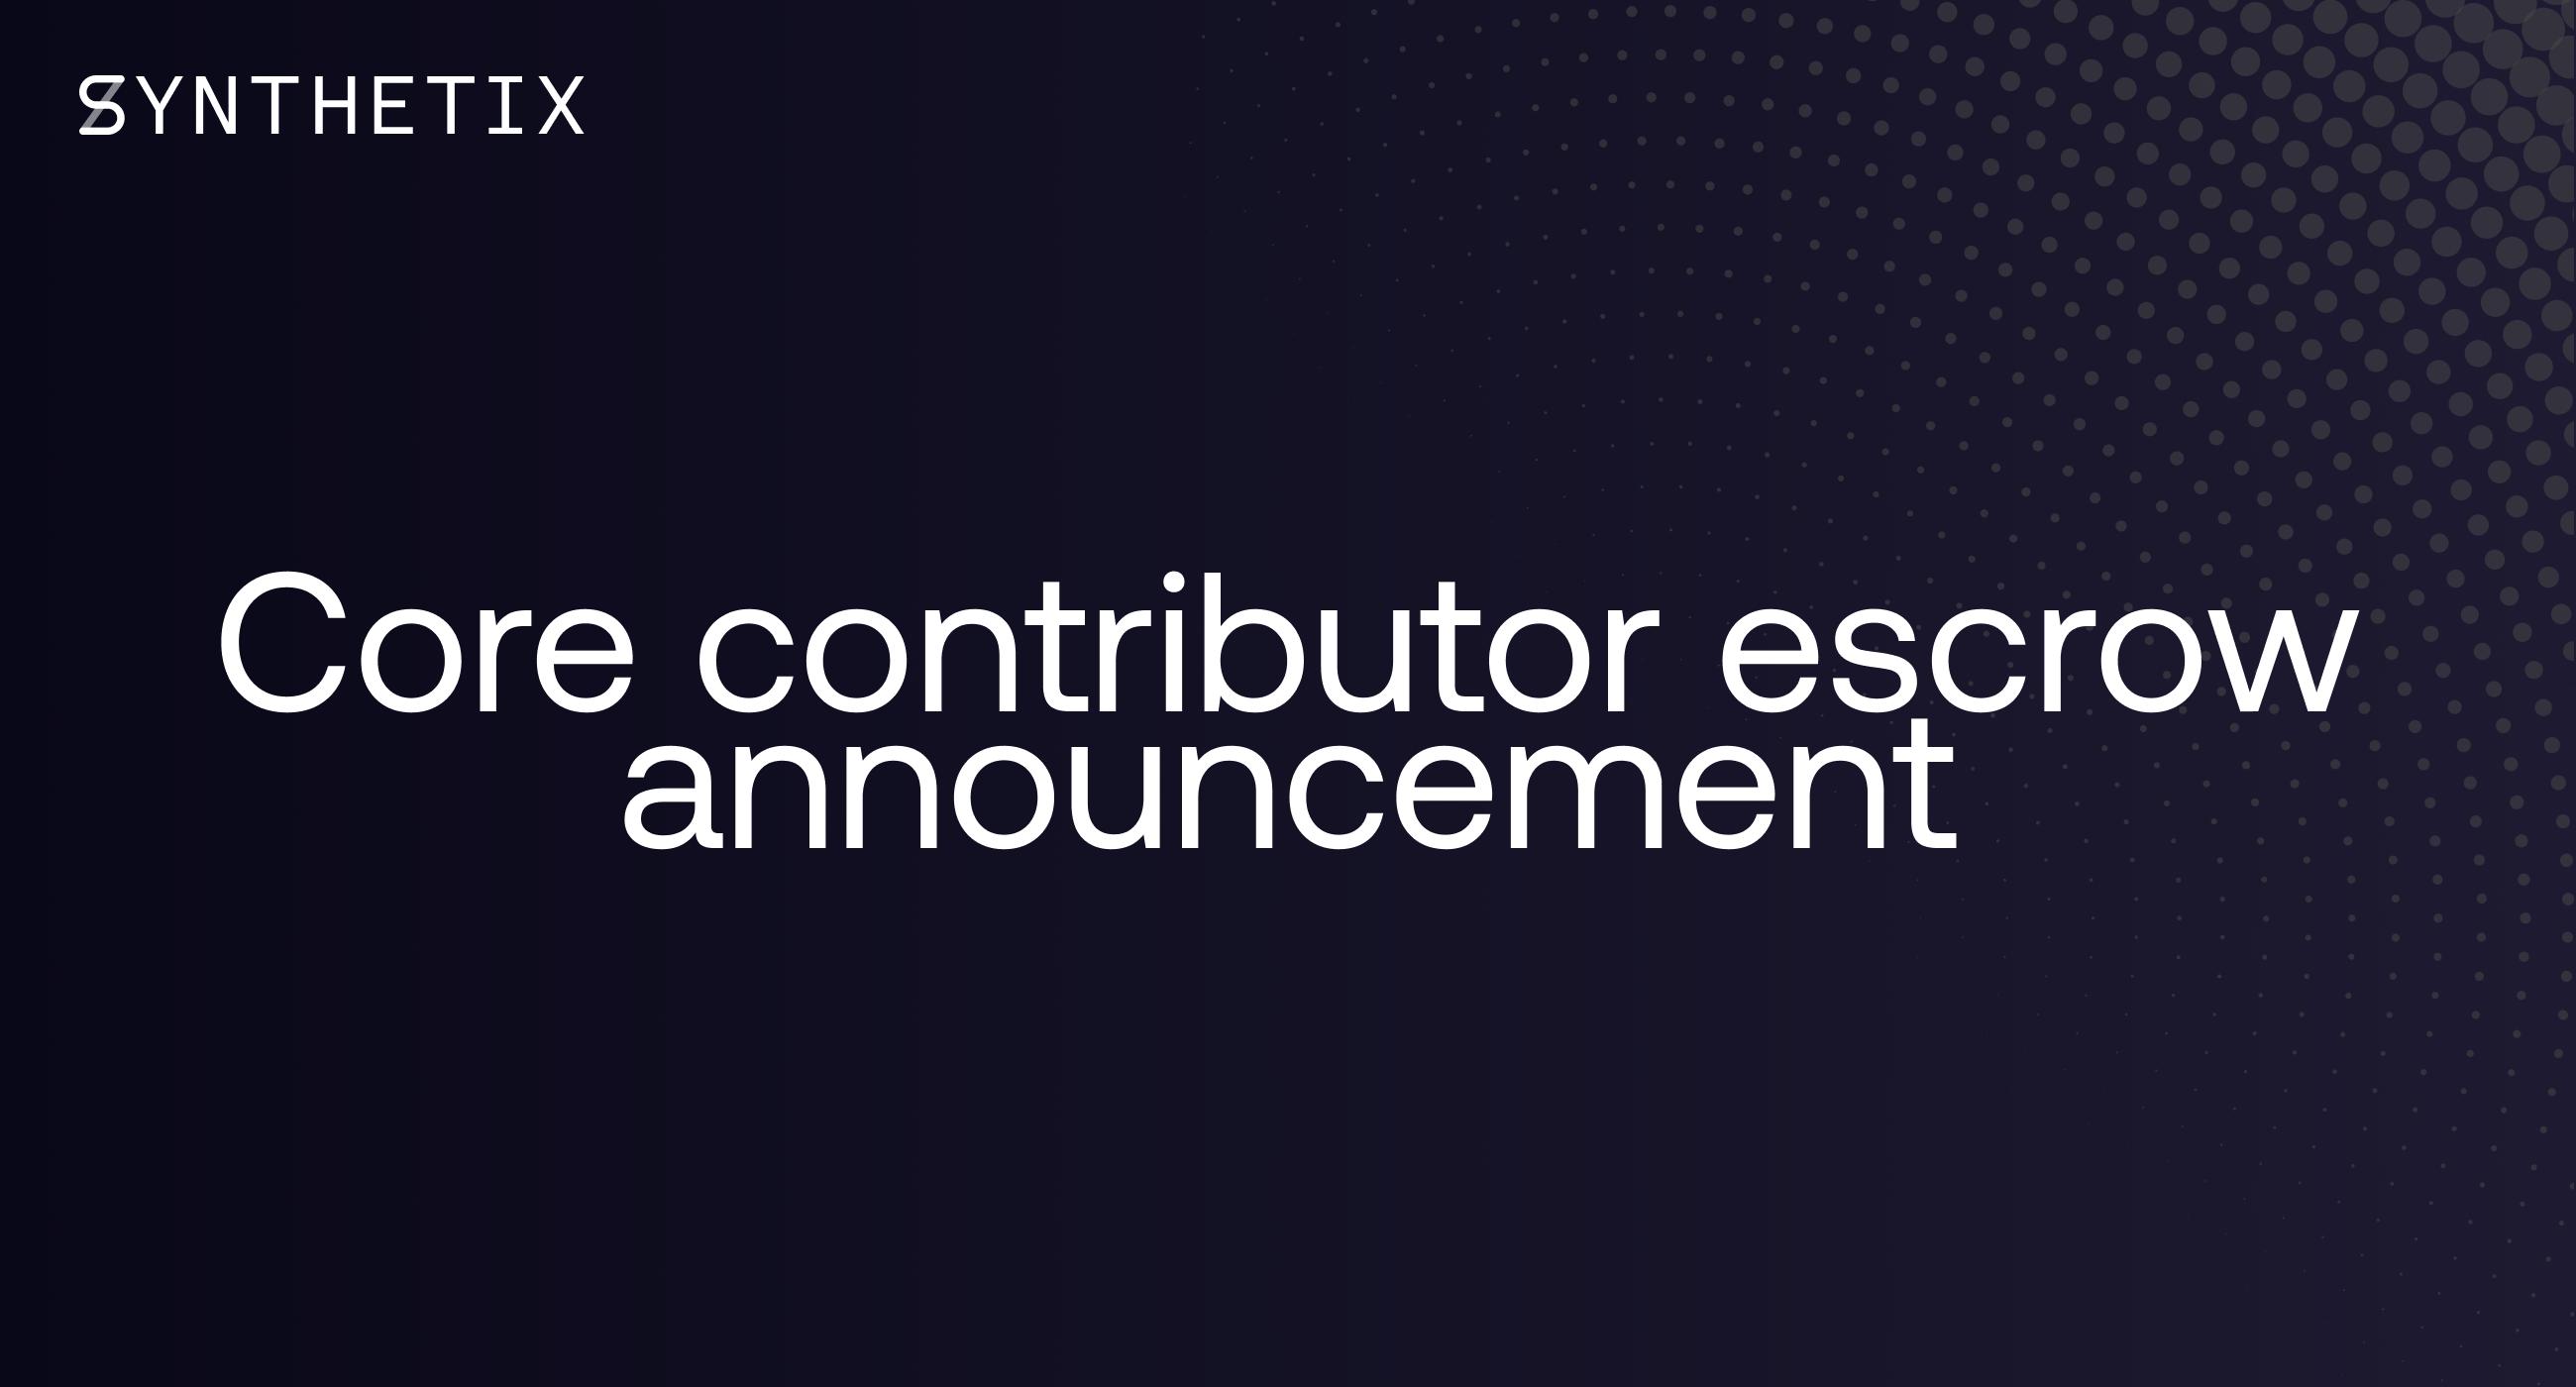 Core Contributor Escrow Announcement